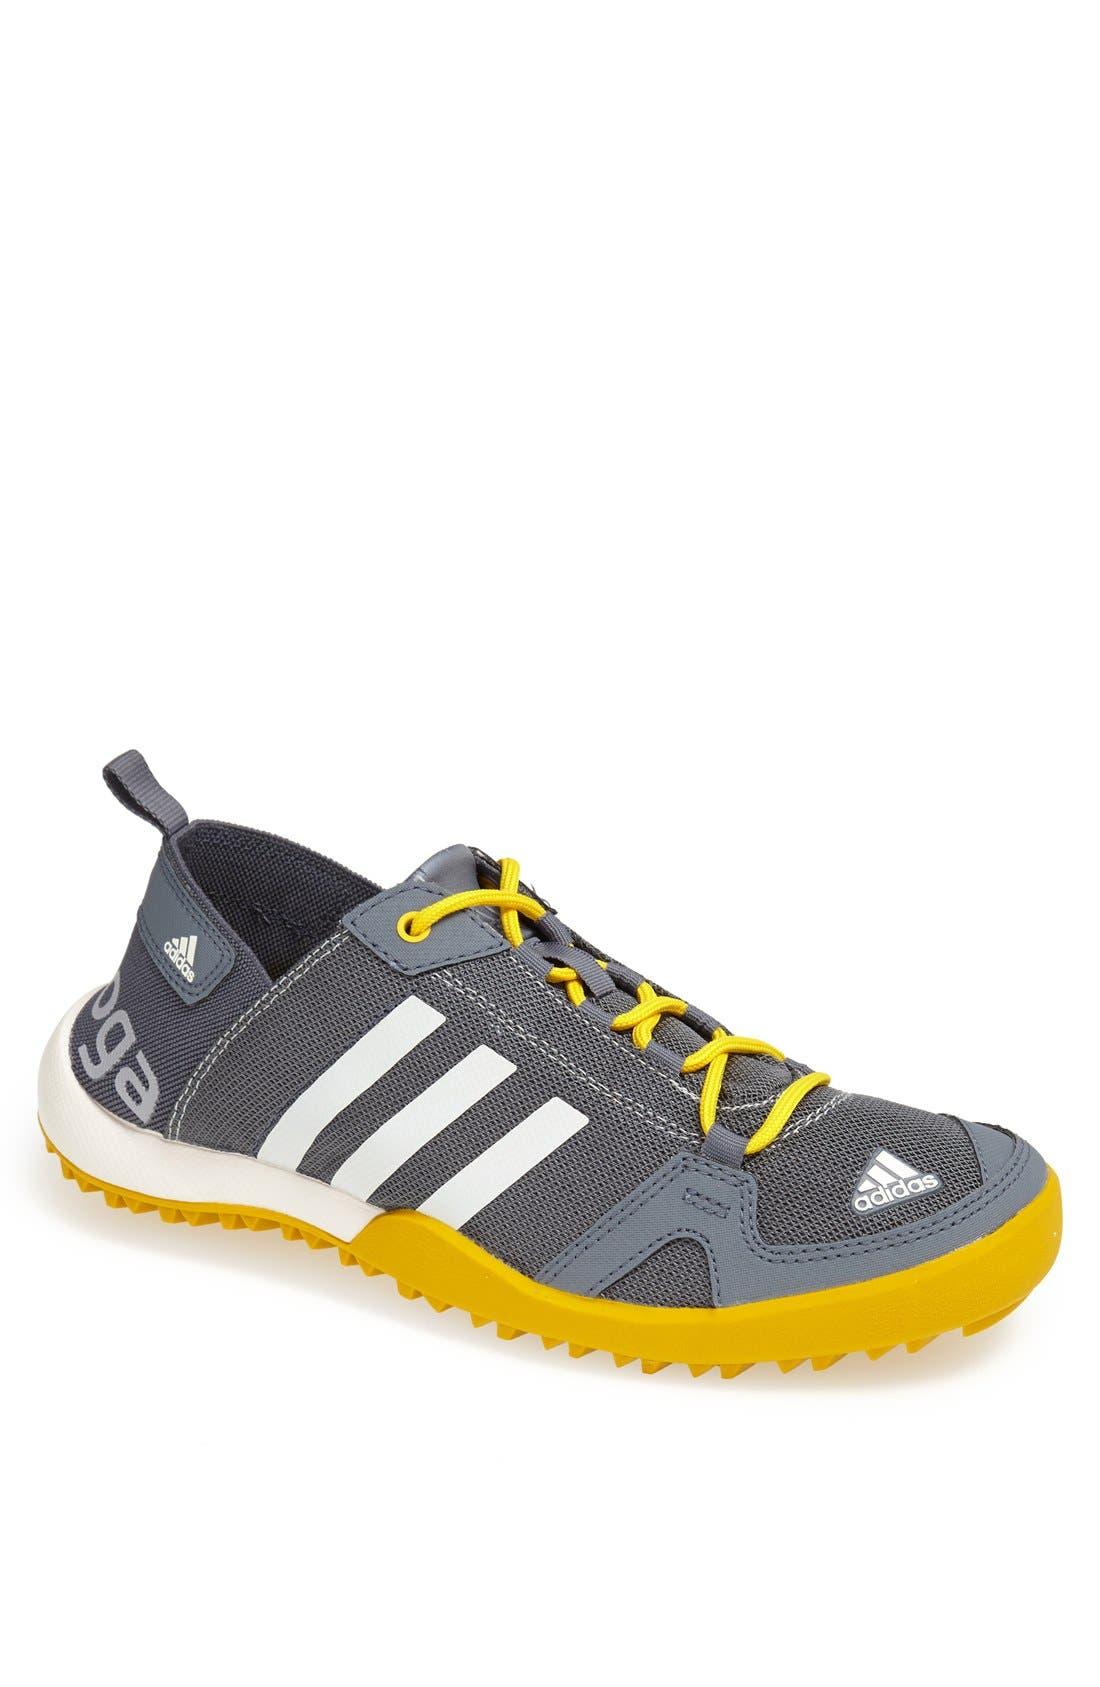 ADIDAS 'CLIMACOOL<sup>®</sup> Daroga Two 13' Walking Shoe, Main, color, 021